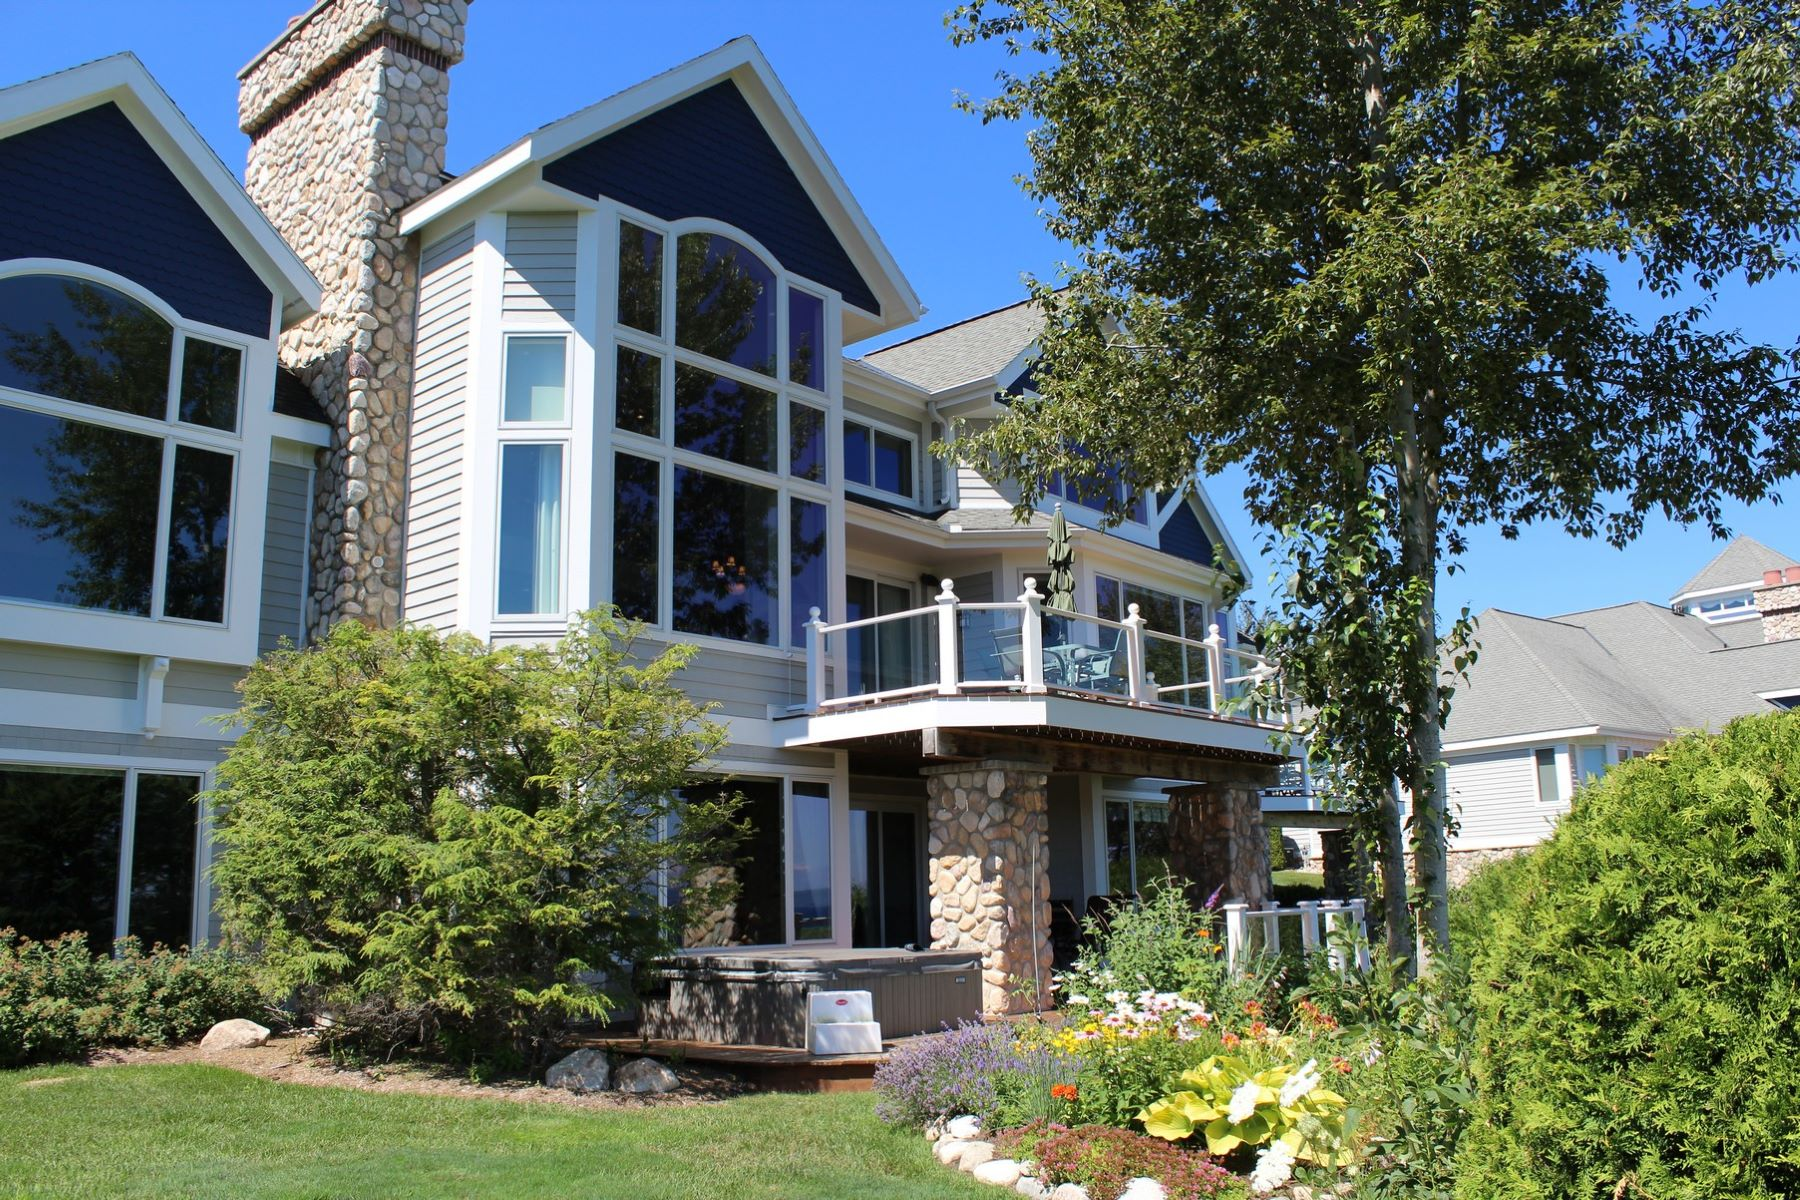 شقة بعمارة للـ Sale في Quarry Bluff 22 6420 Quarry Ridge Drive, Bay Harbor, Michigan, 49770 United States